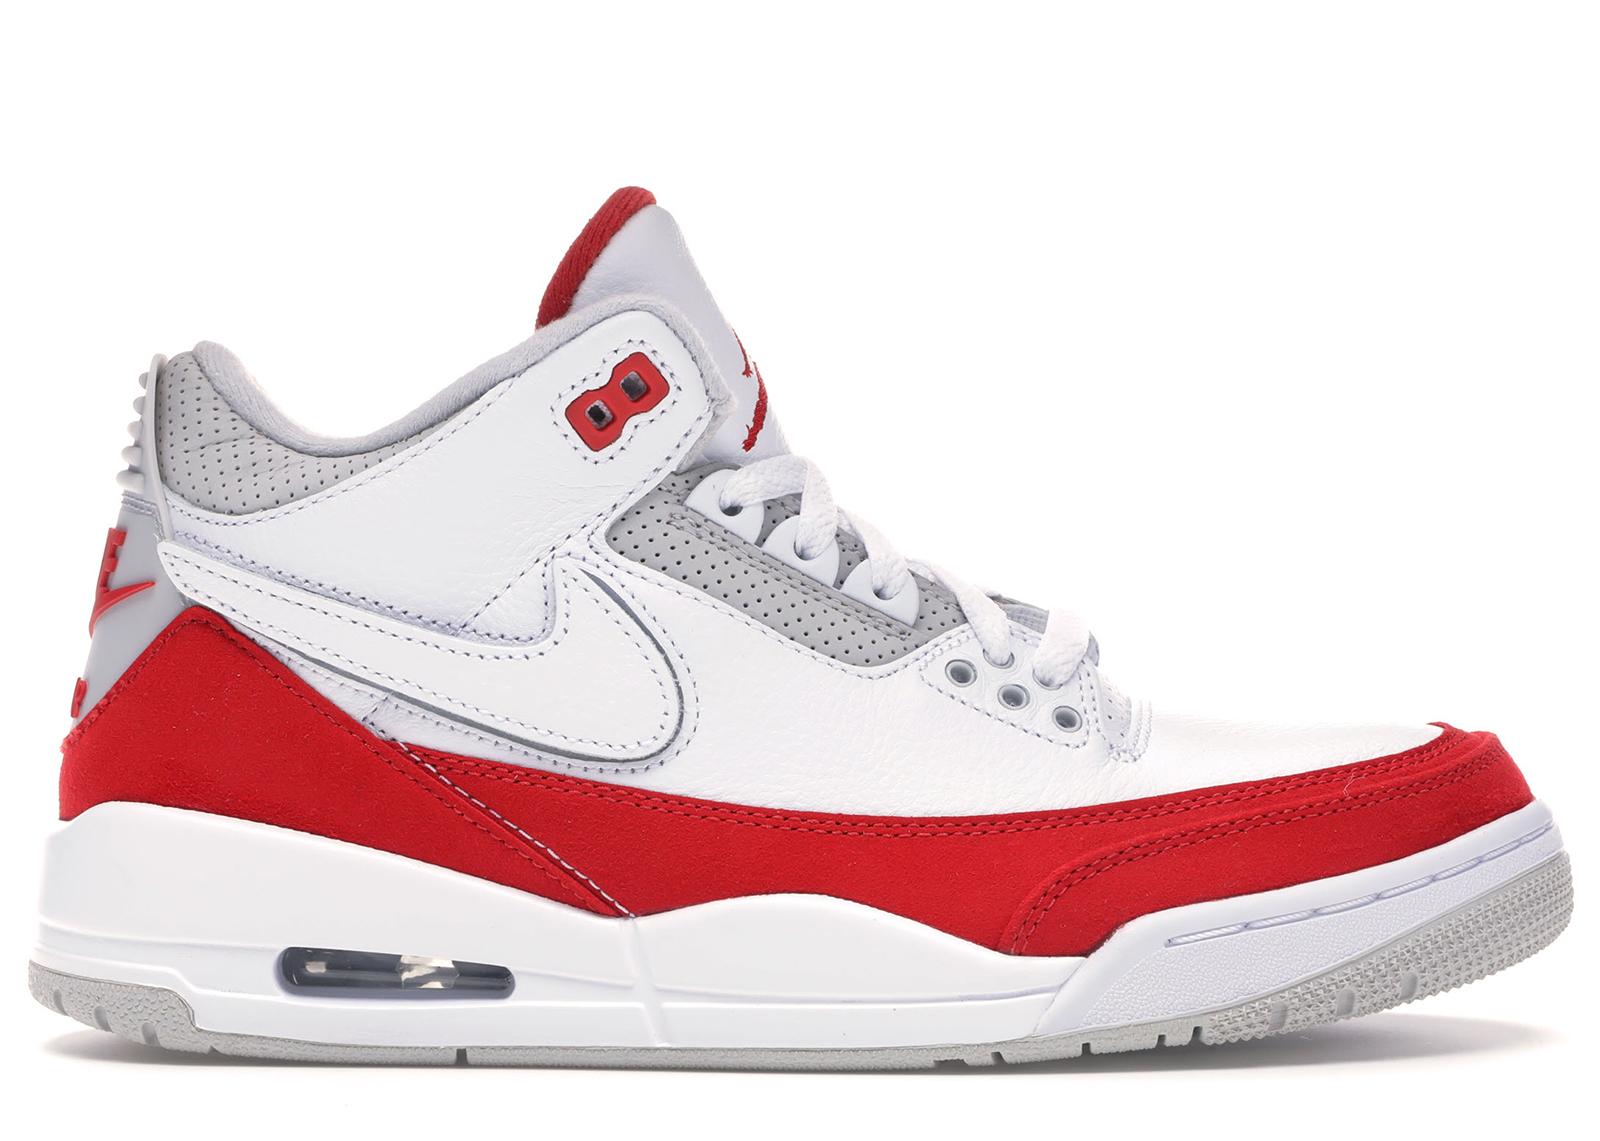 Buy Air Jordan 3 Shoes & Deadstock Sneakers